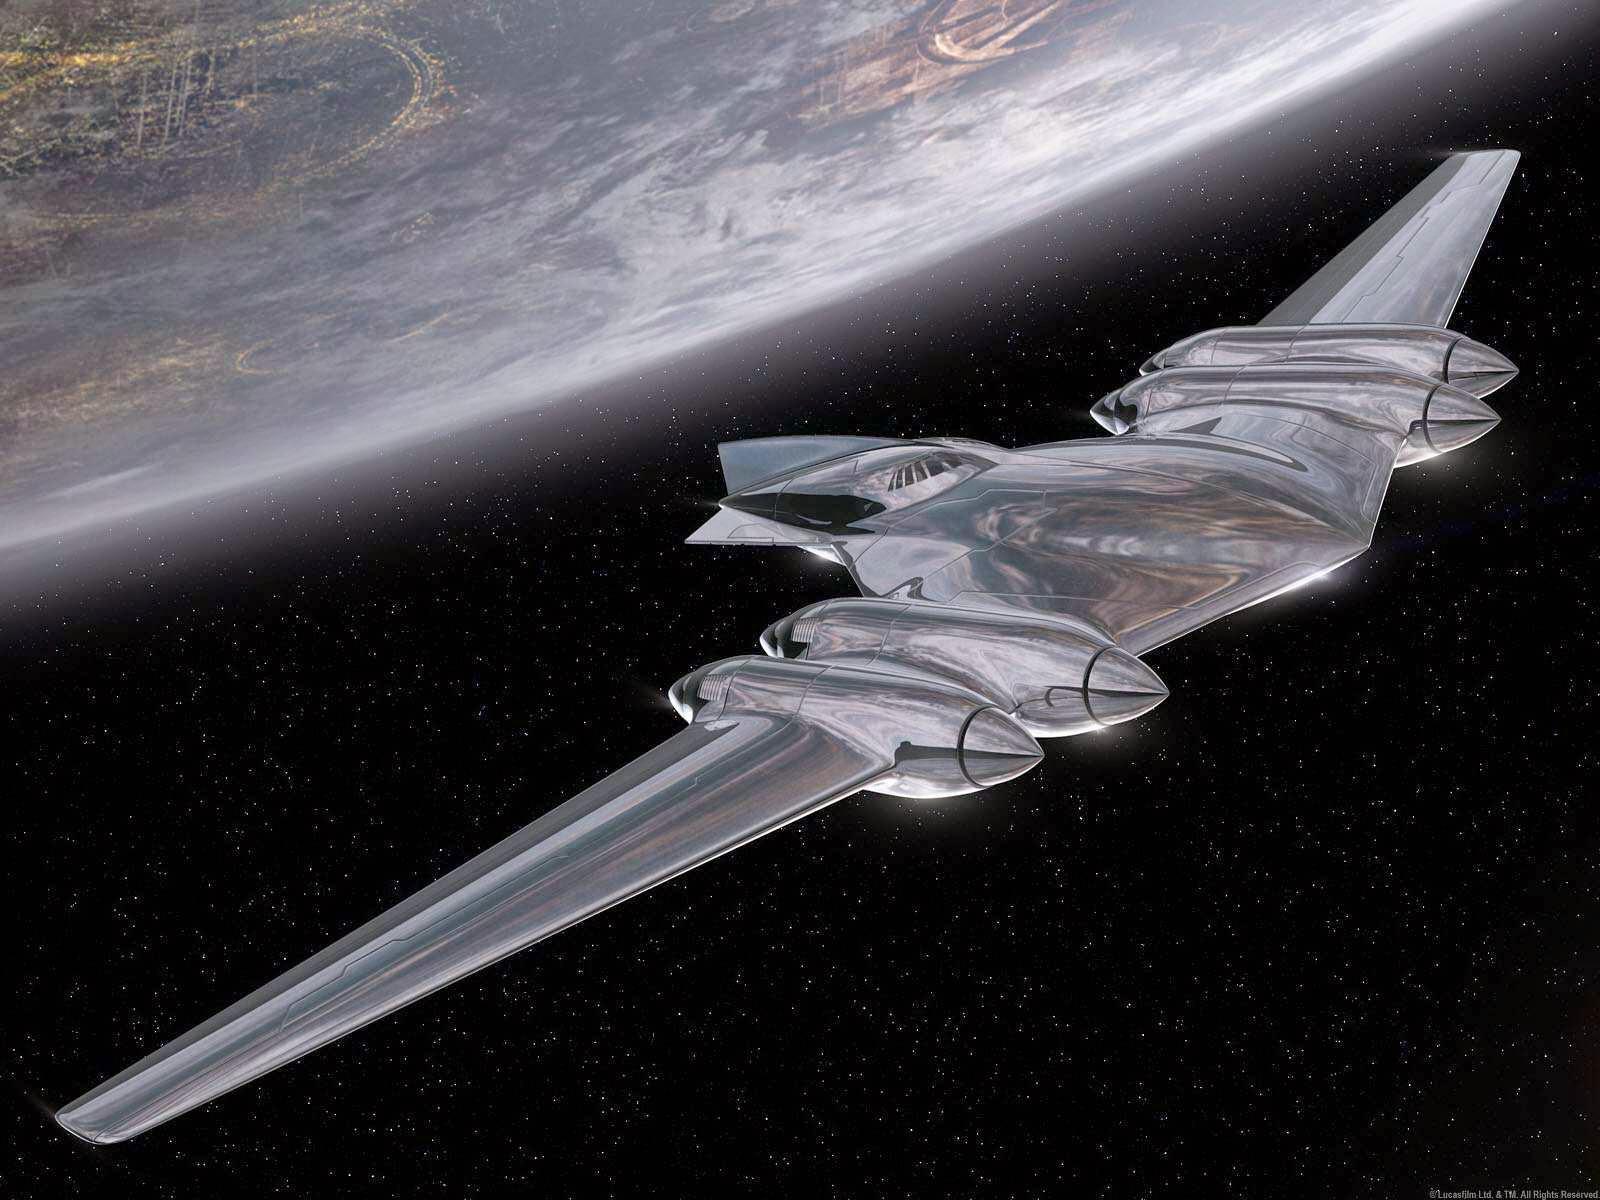 the osr library white star starship options and star wars ship sampler. Black Bedroom Furniture Sets. Home Design Ideas